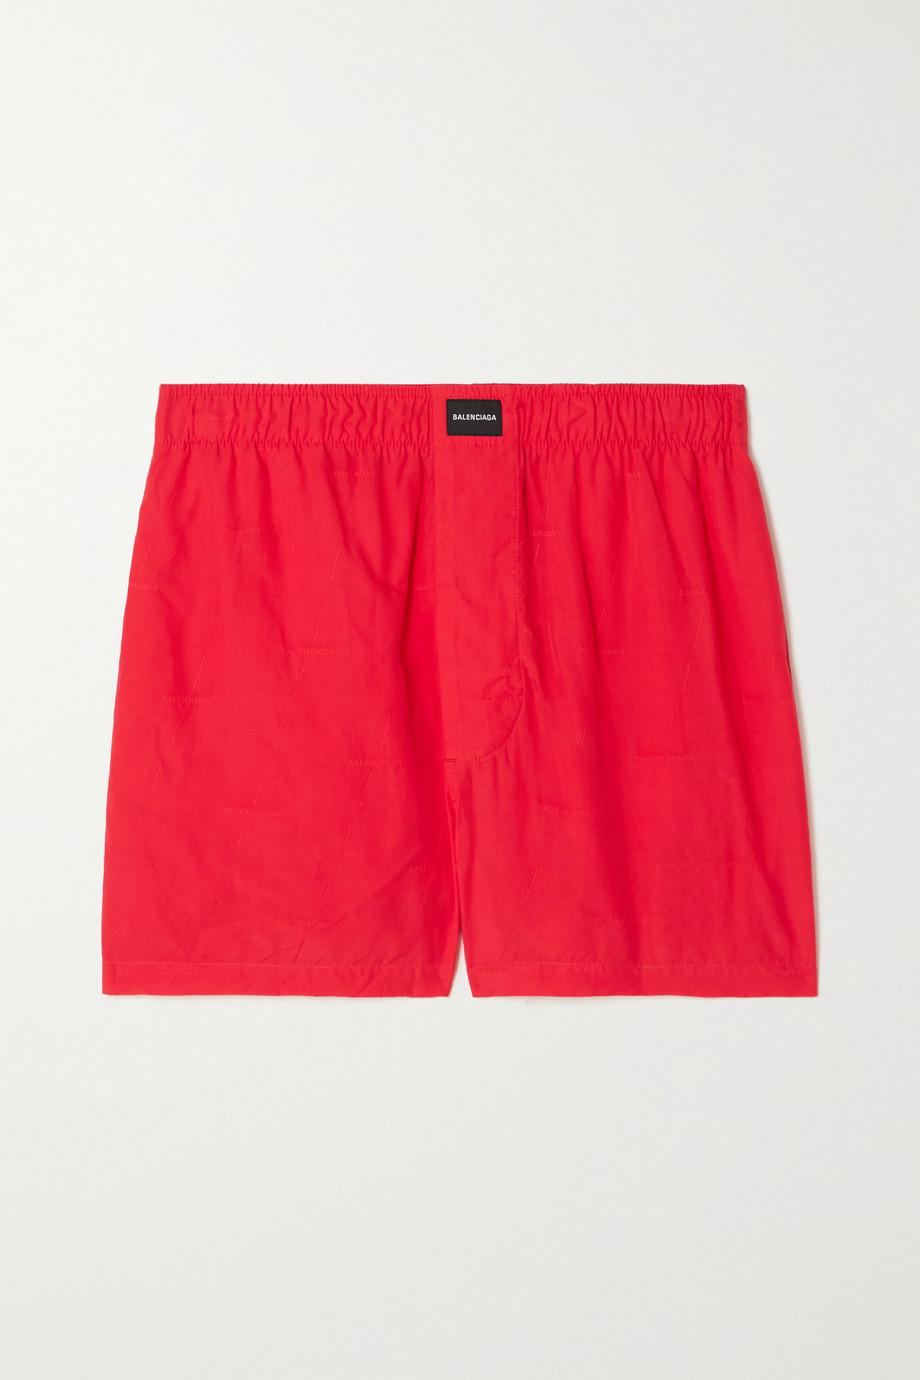 Balenciaga Appliquéd crinkled Lyocell-jacquard shorts